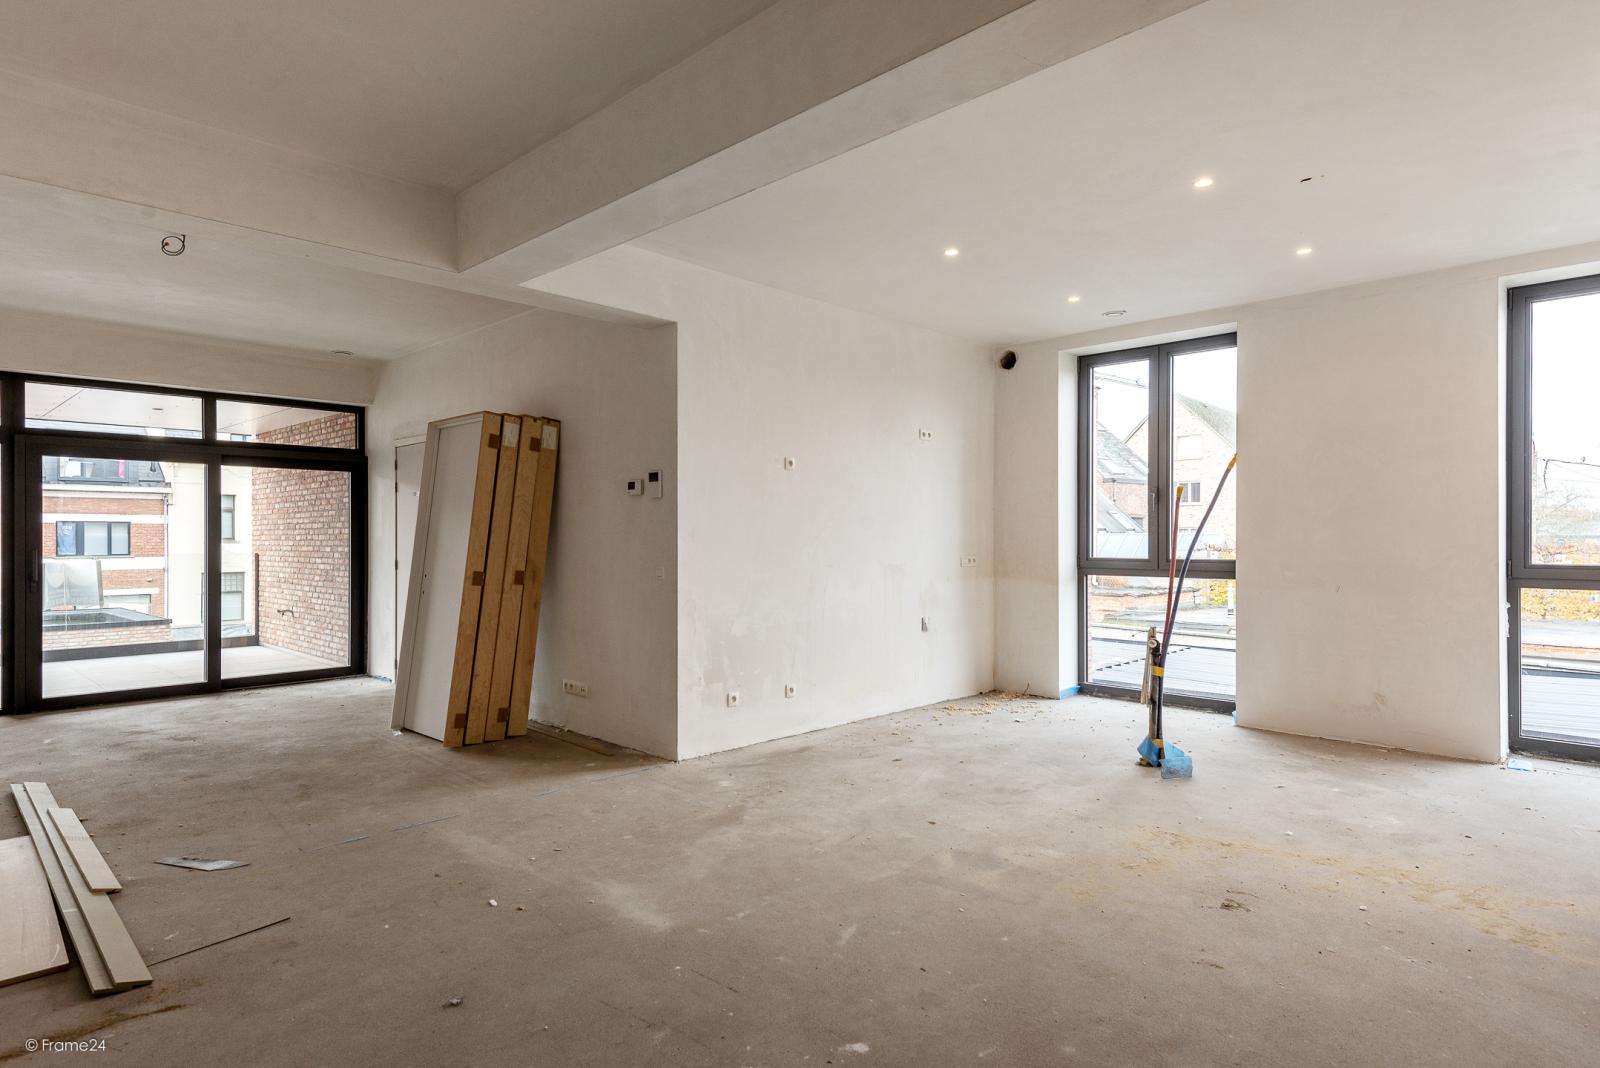 Riant vernieuwd appartement (147 m²) op centrale ligging te Walem! afbeelding 3